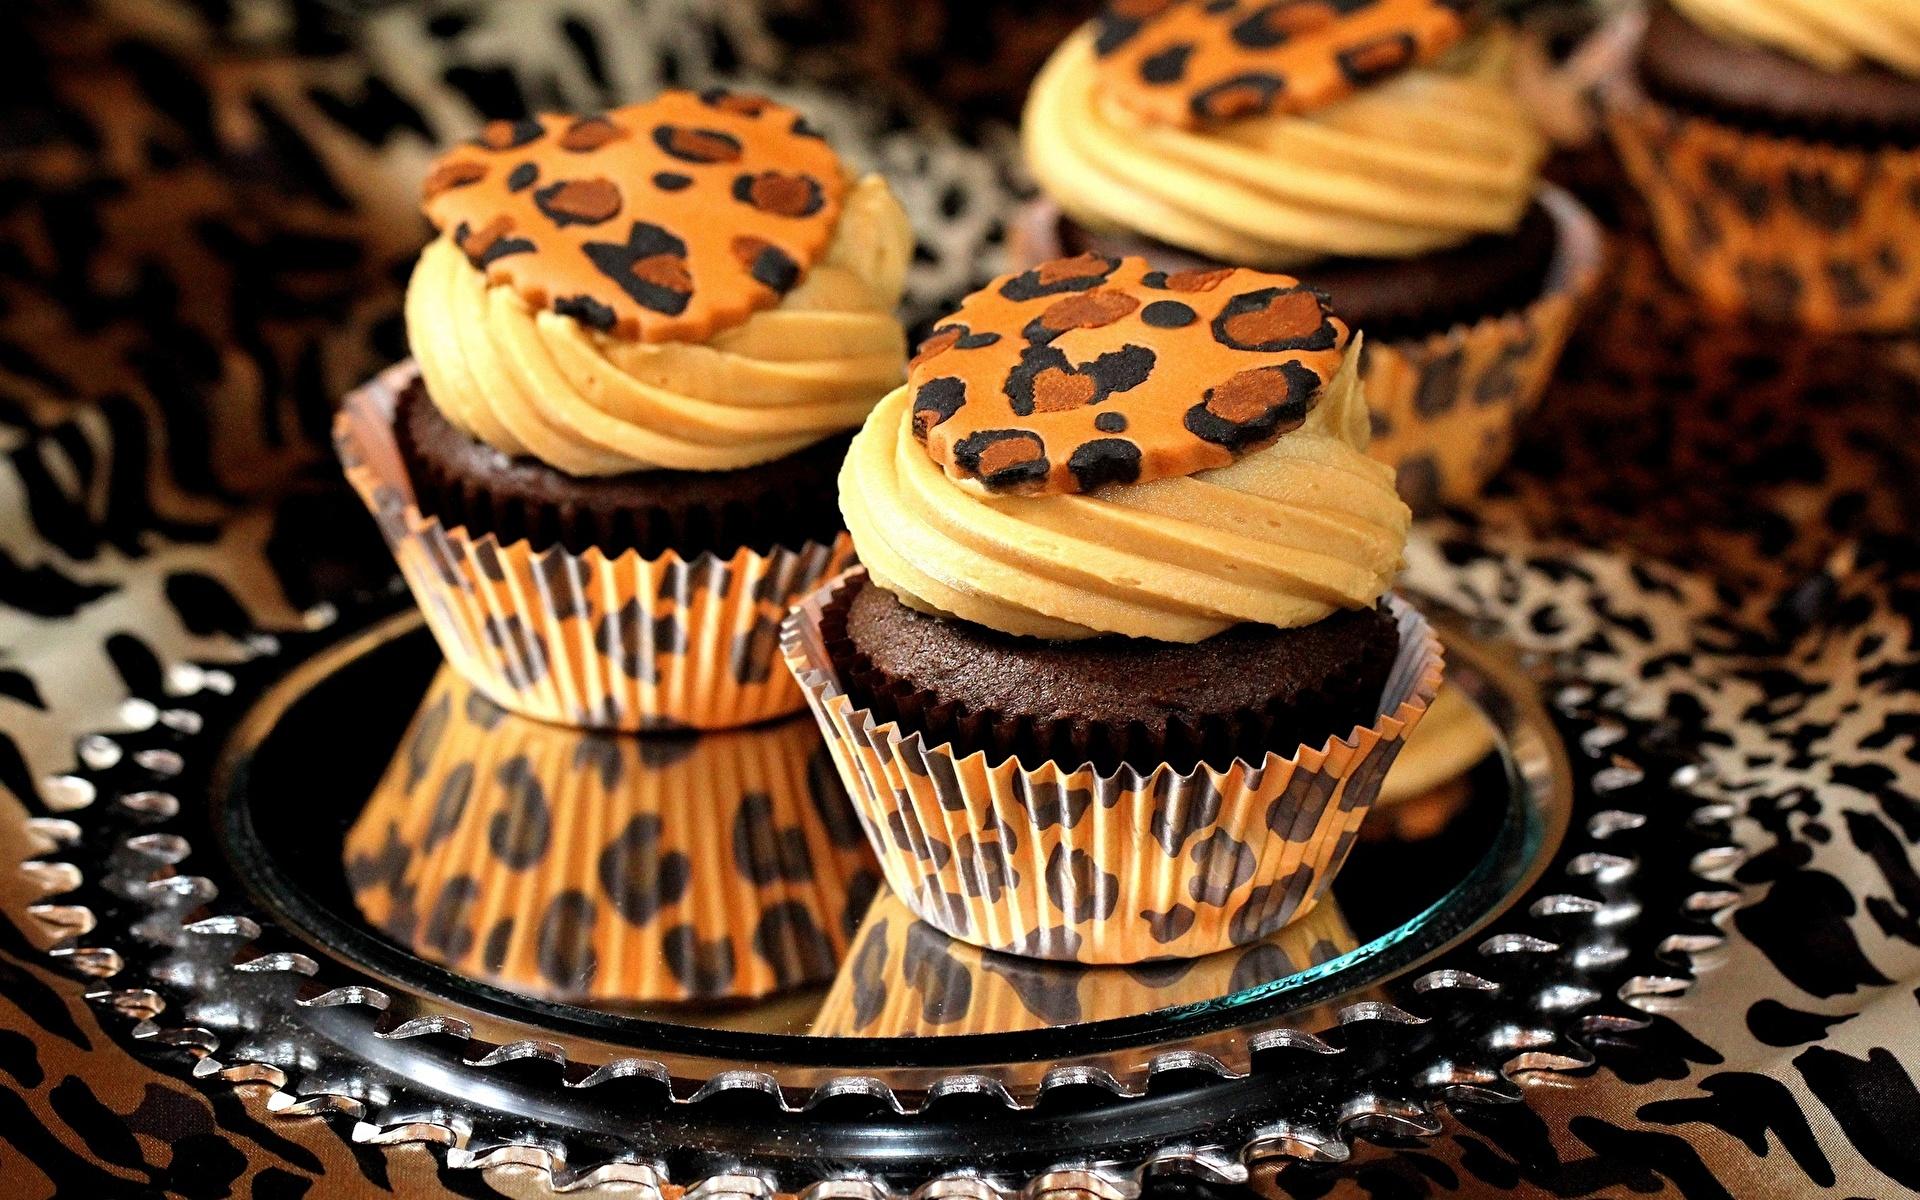 еда кекс шоколад food cupcake chocolate скачать